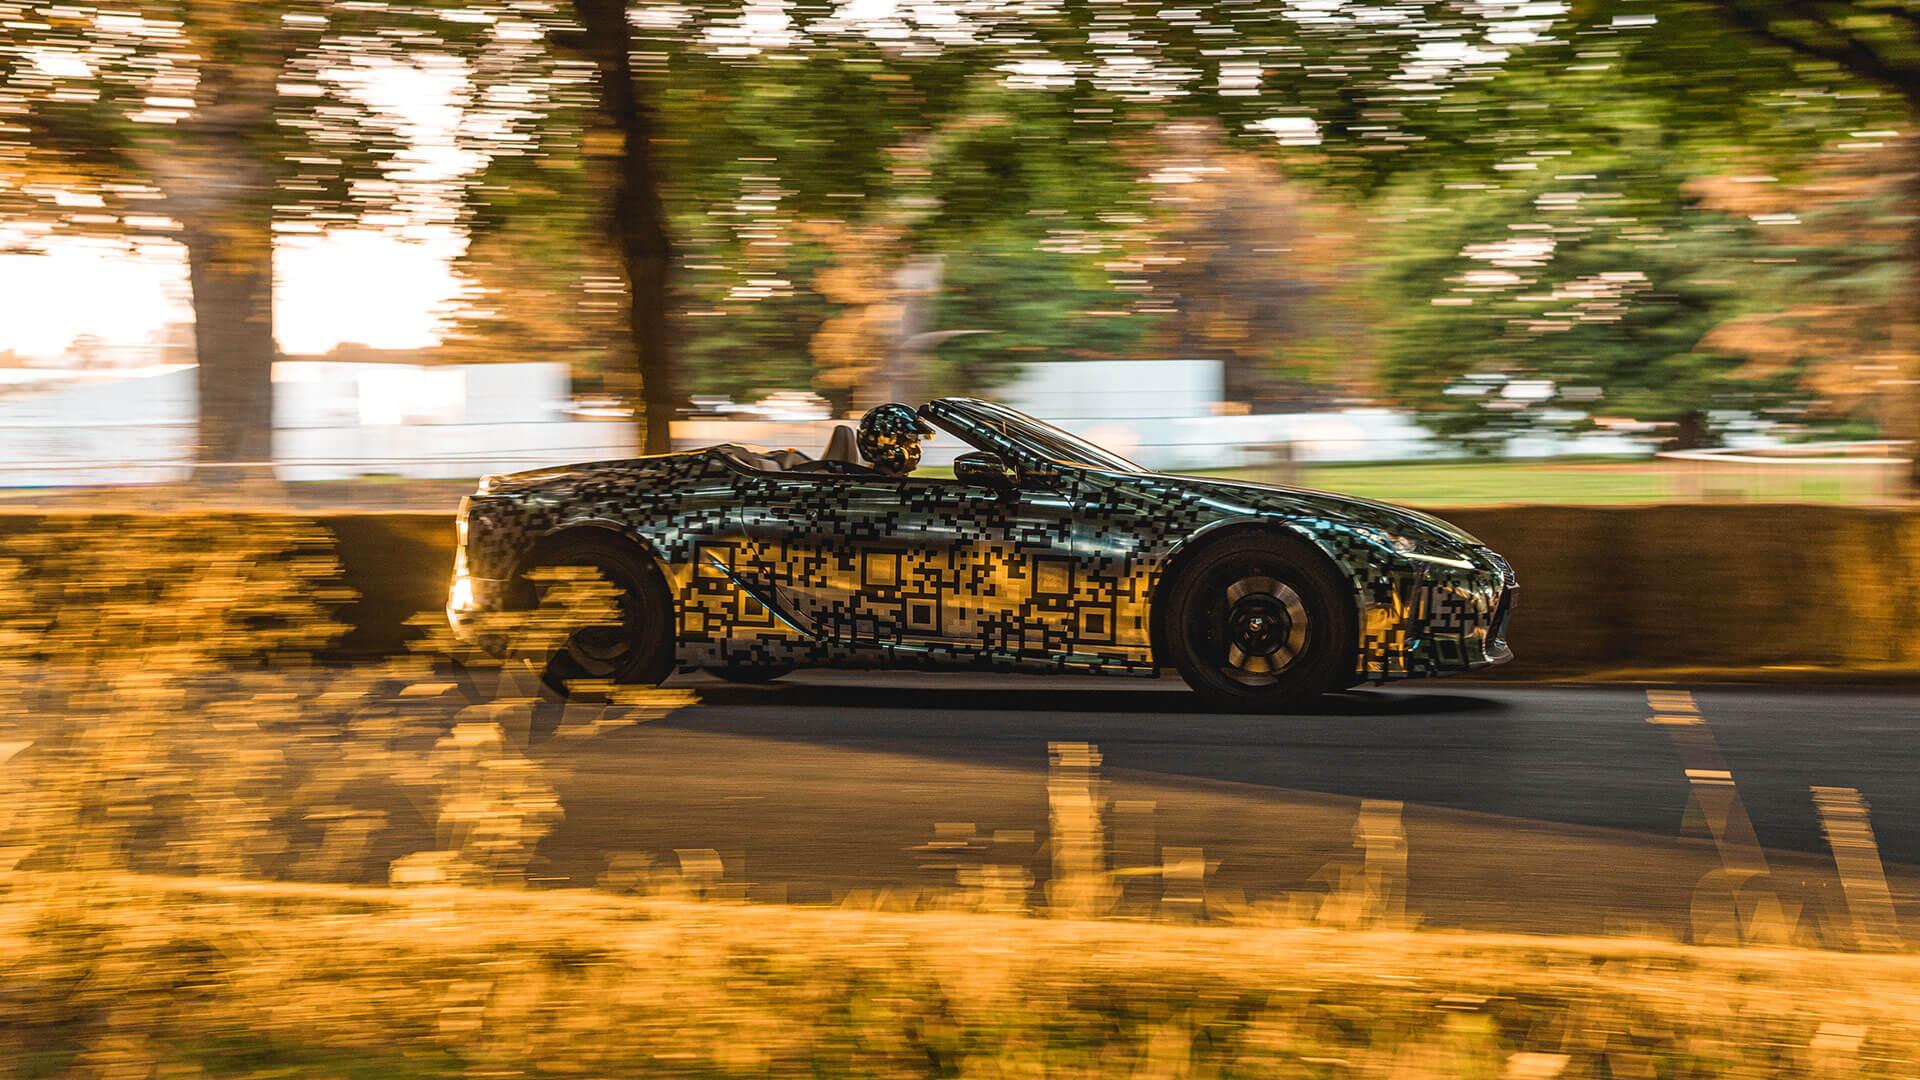 Lexus LC Convertible 03 Gallery Item Image